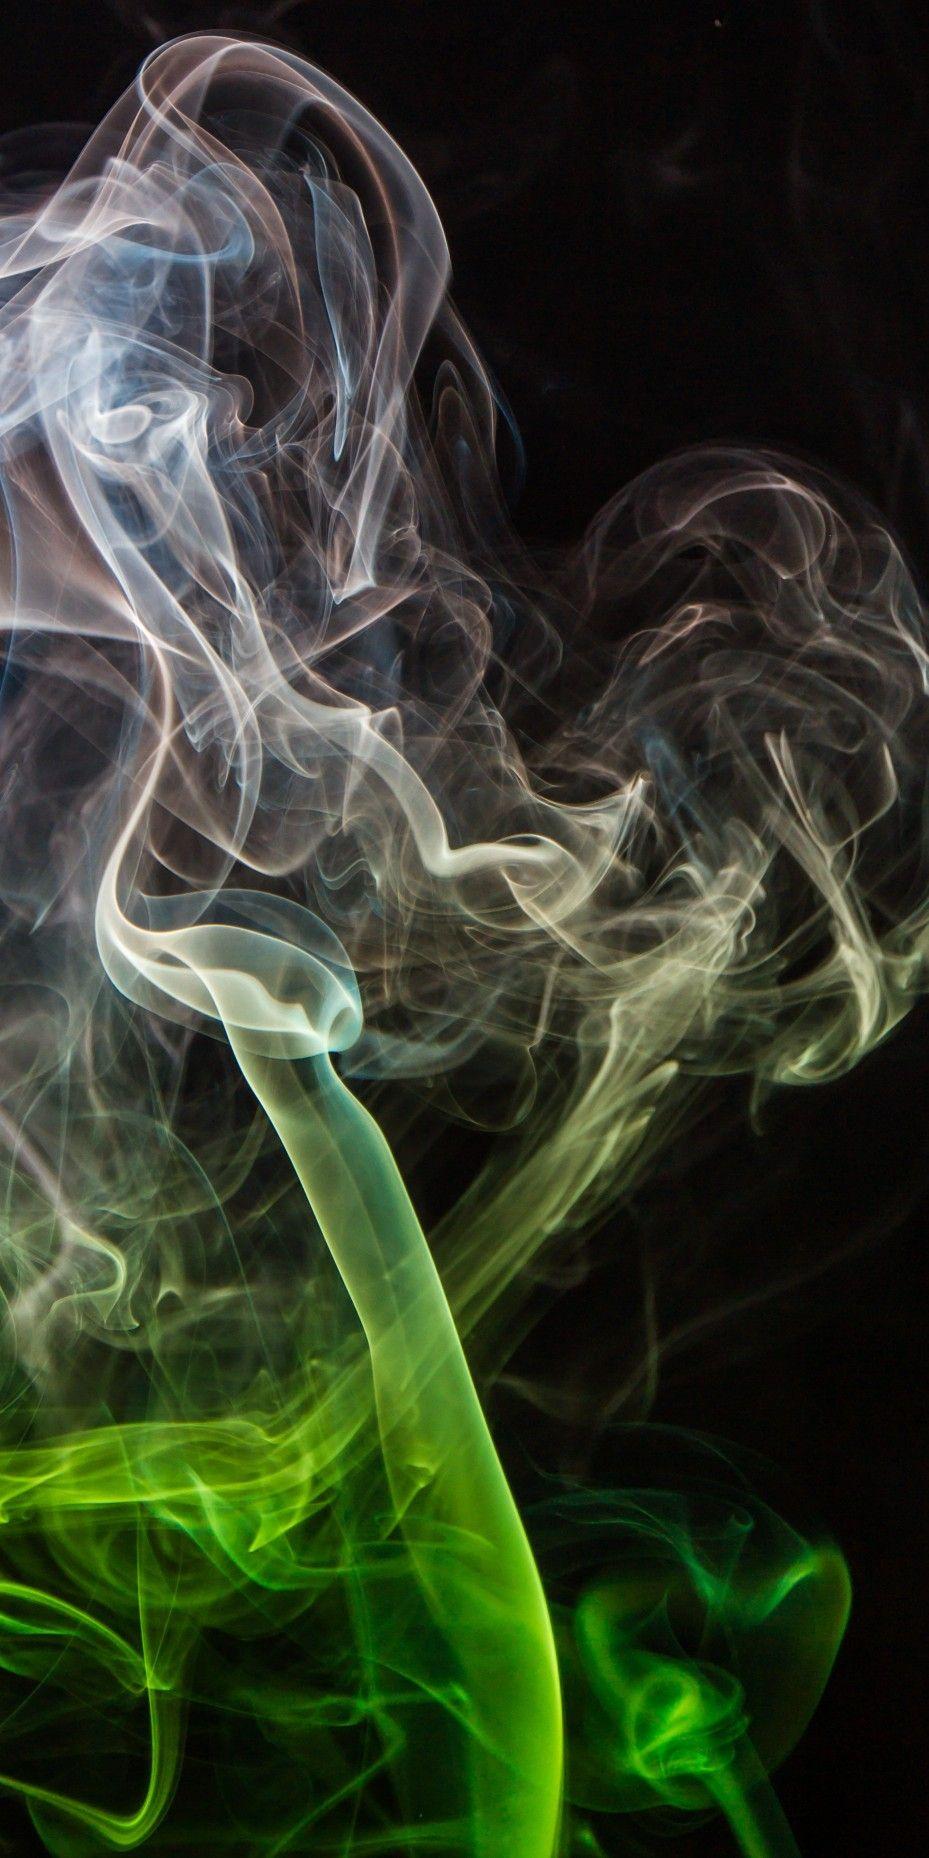 Pin By Iyan Sofyan On Abstract Amoled Liquid Gradient Smoke Wallpaper Smoke Painting Smoke Pictures